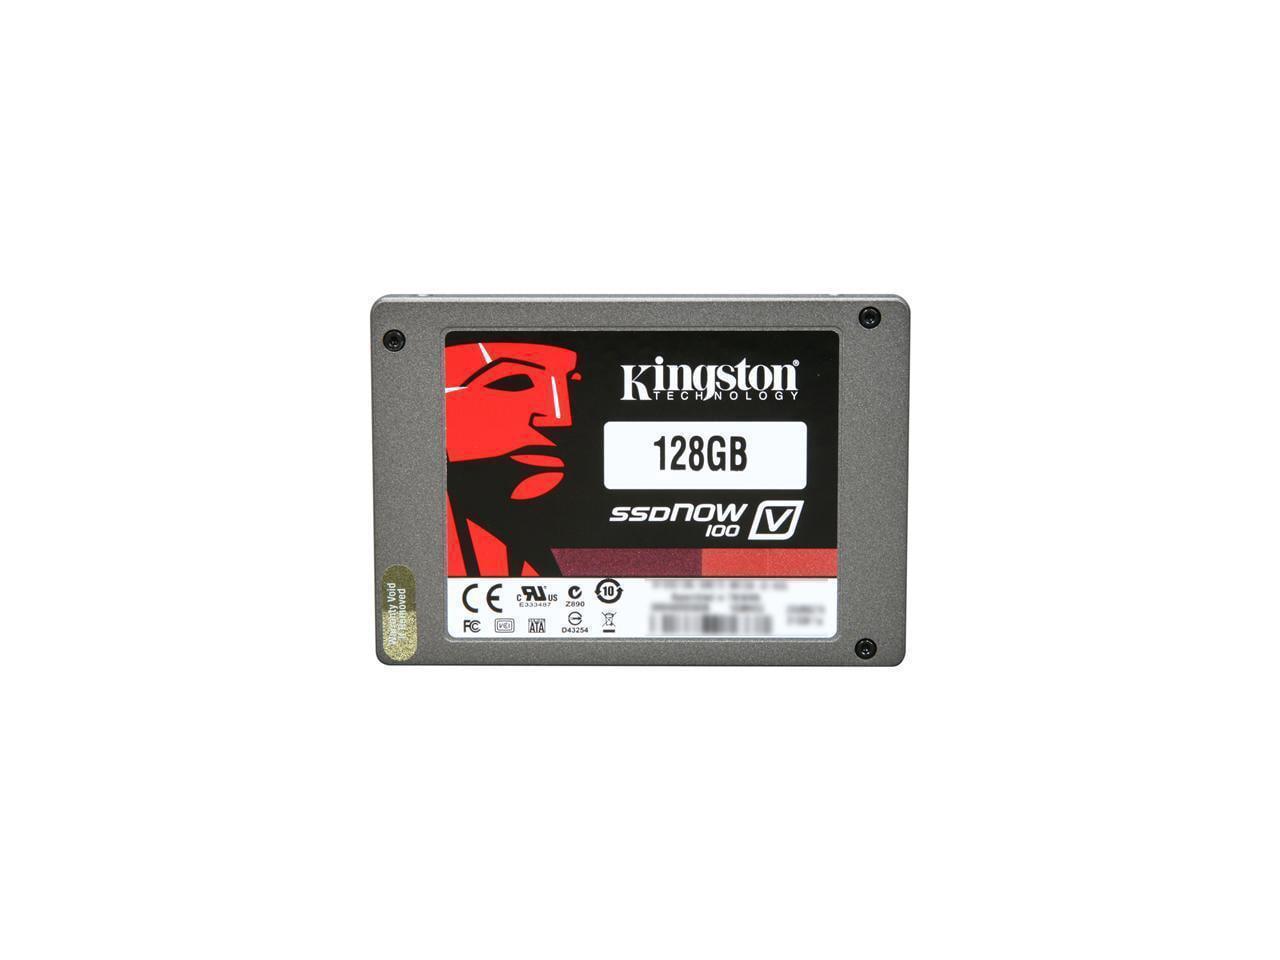 NEW DRIVERS: KINGSTON SV100S2128GZ SSD